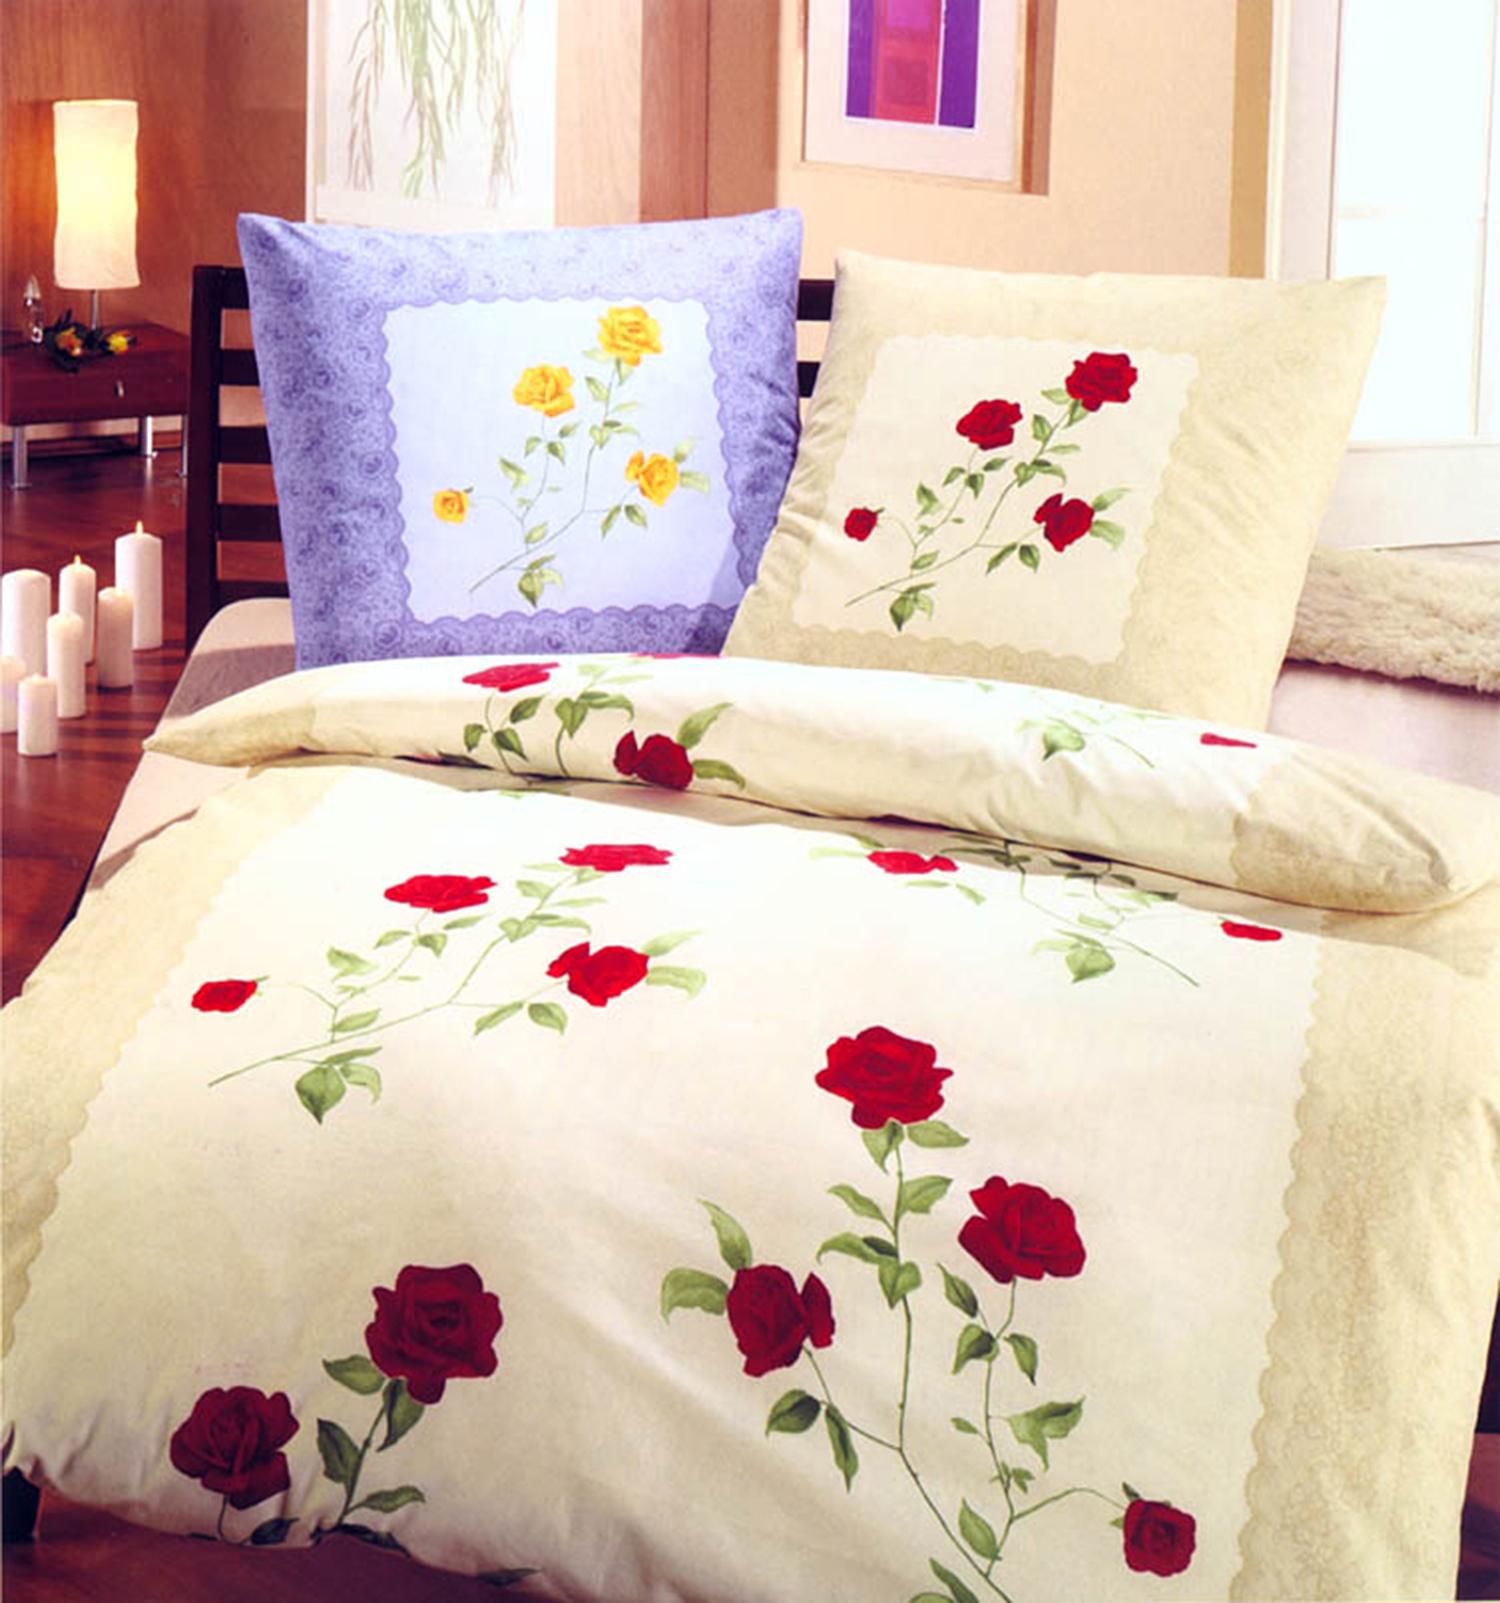 dormisette winter renforce bettw sche rose 135 oder 155 x 220 cm ebay. Black Bedroom Furniture Sets. Home Design Ideas